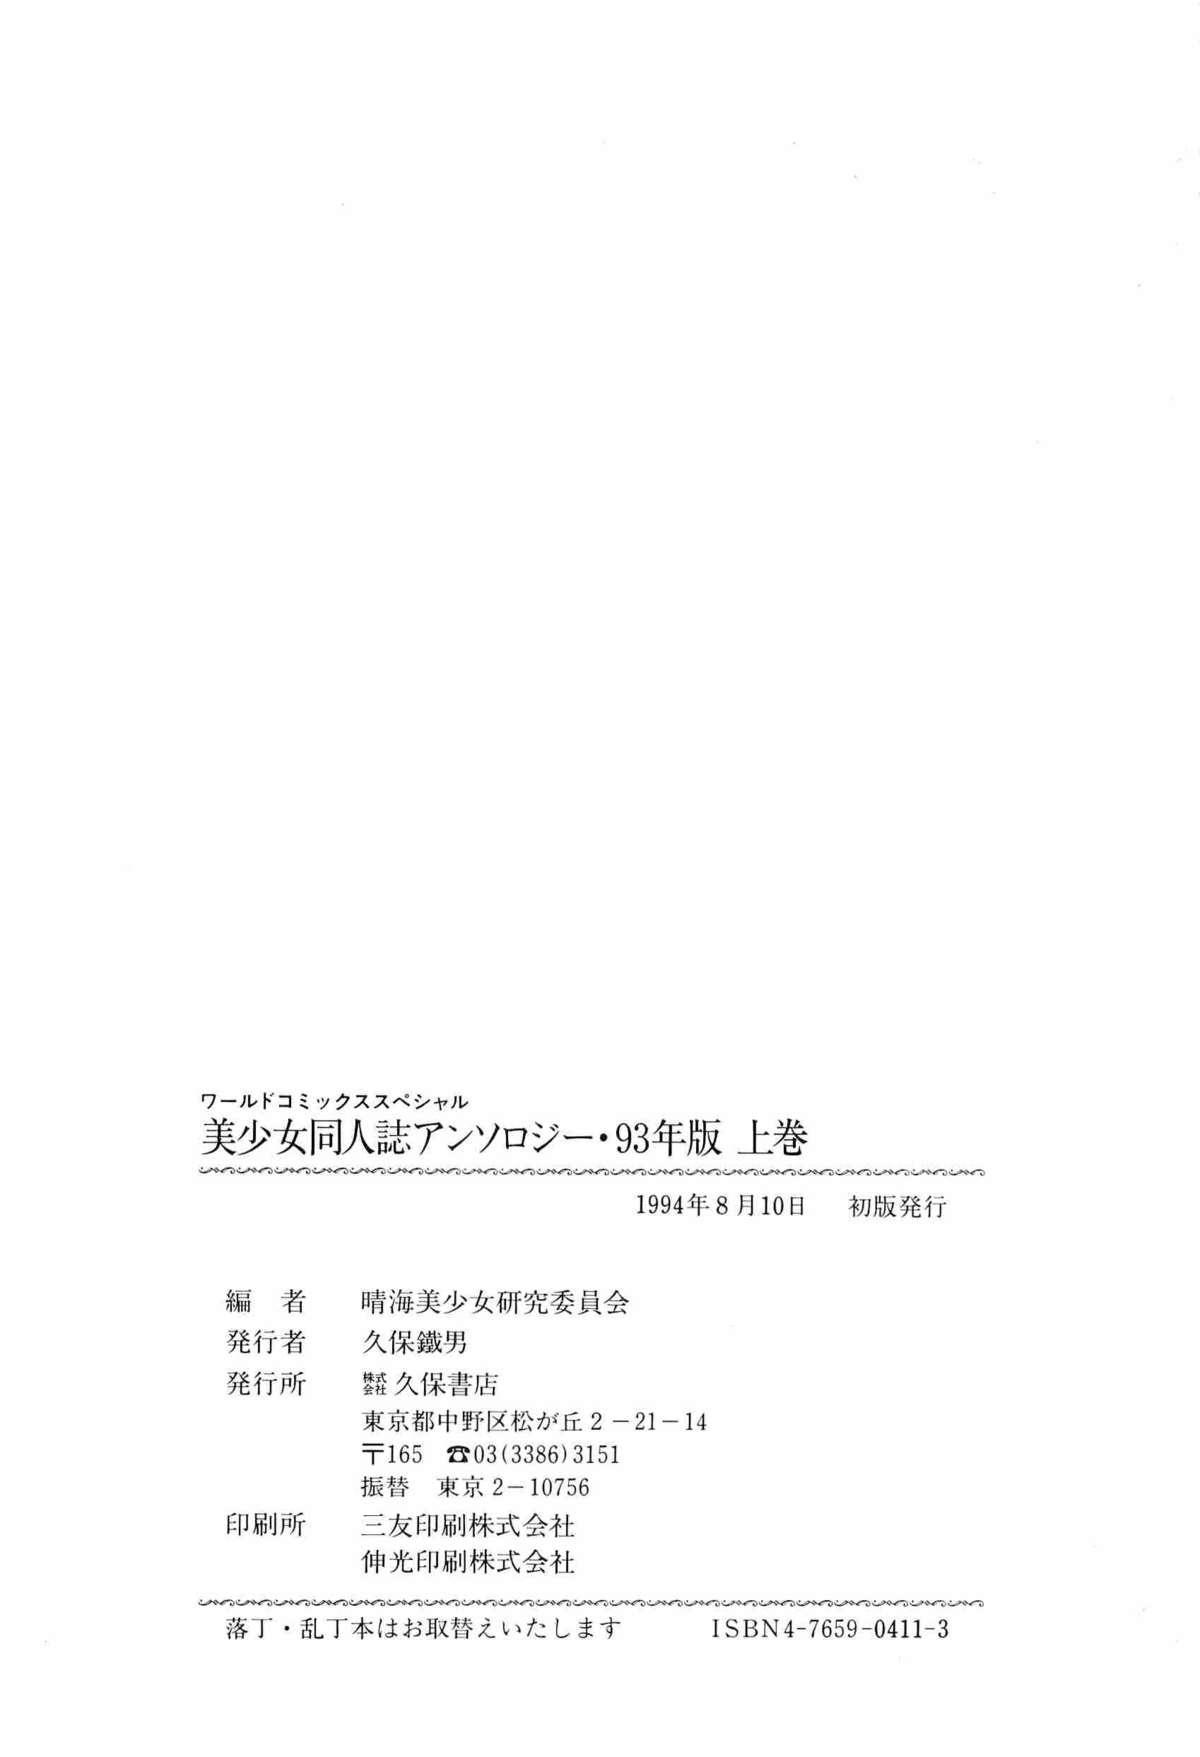 Bisyoujo Anthology '93 jyoukan 146